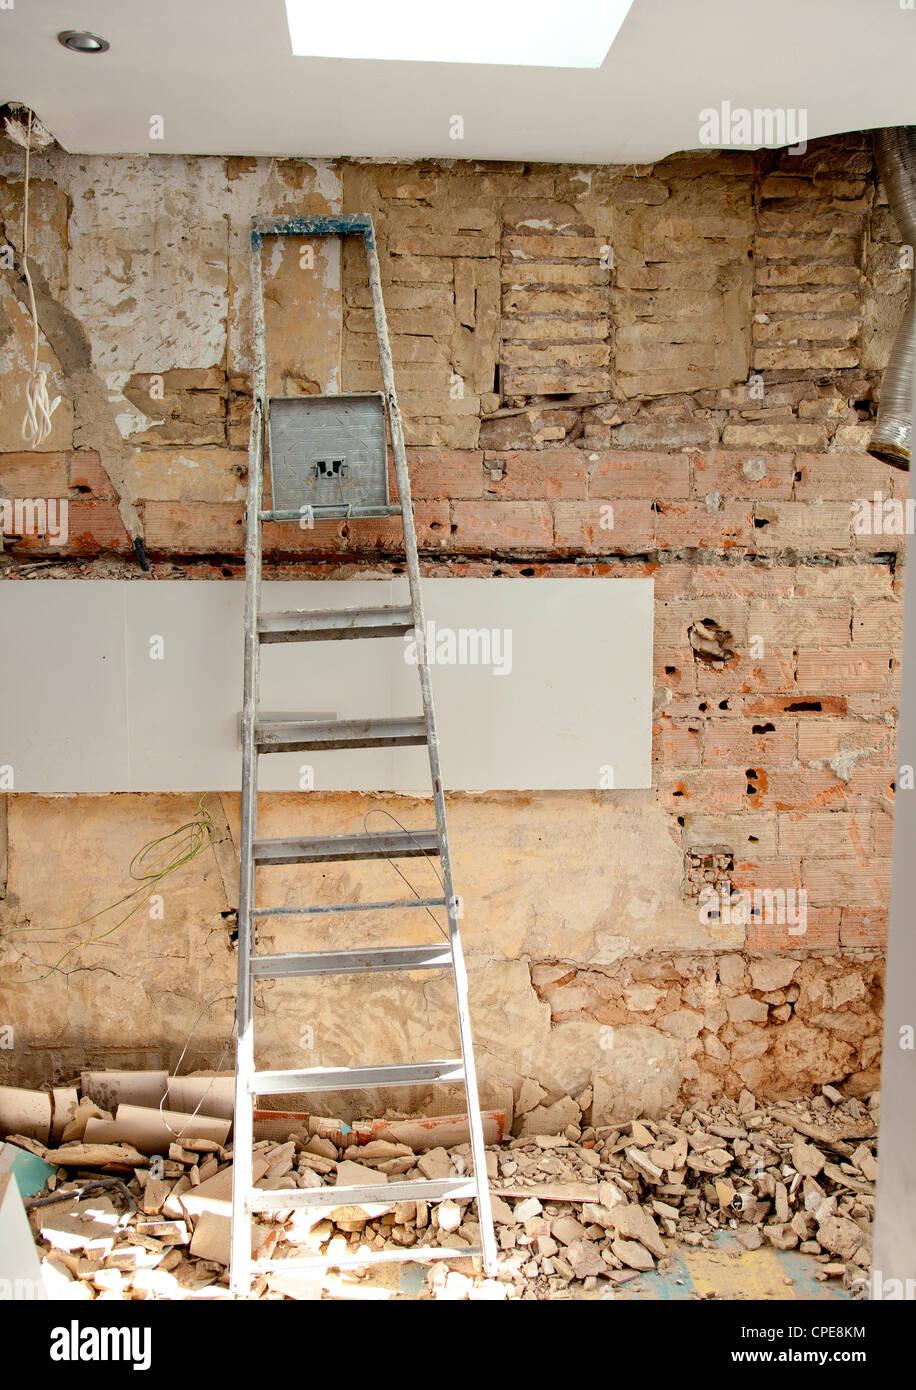 demolition debris in kitchen interior construction and ladder - Stock Image